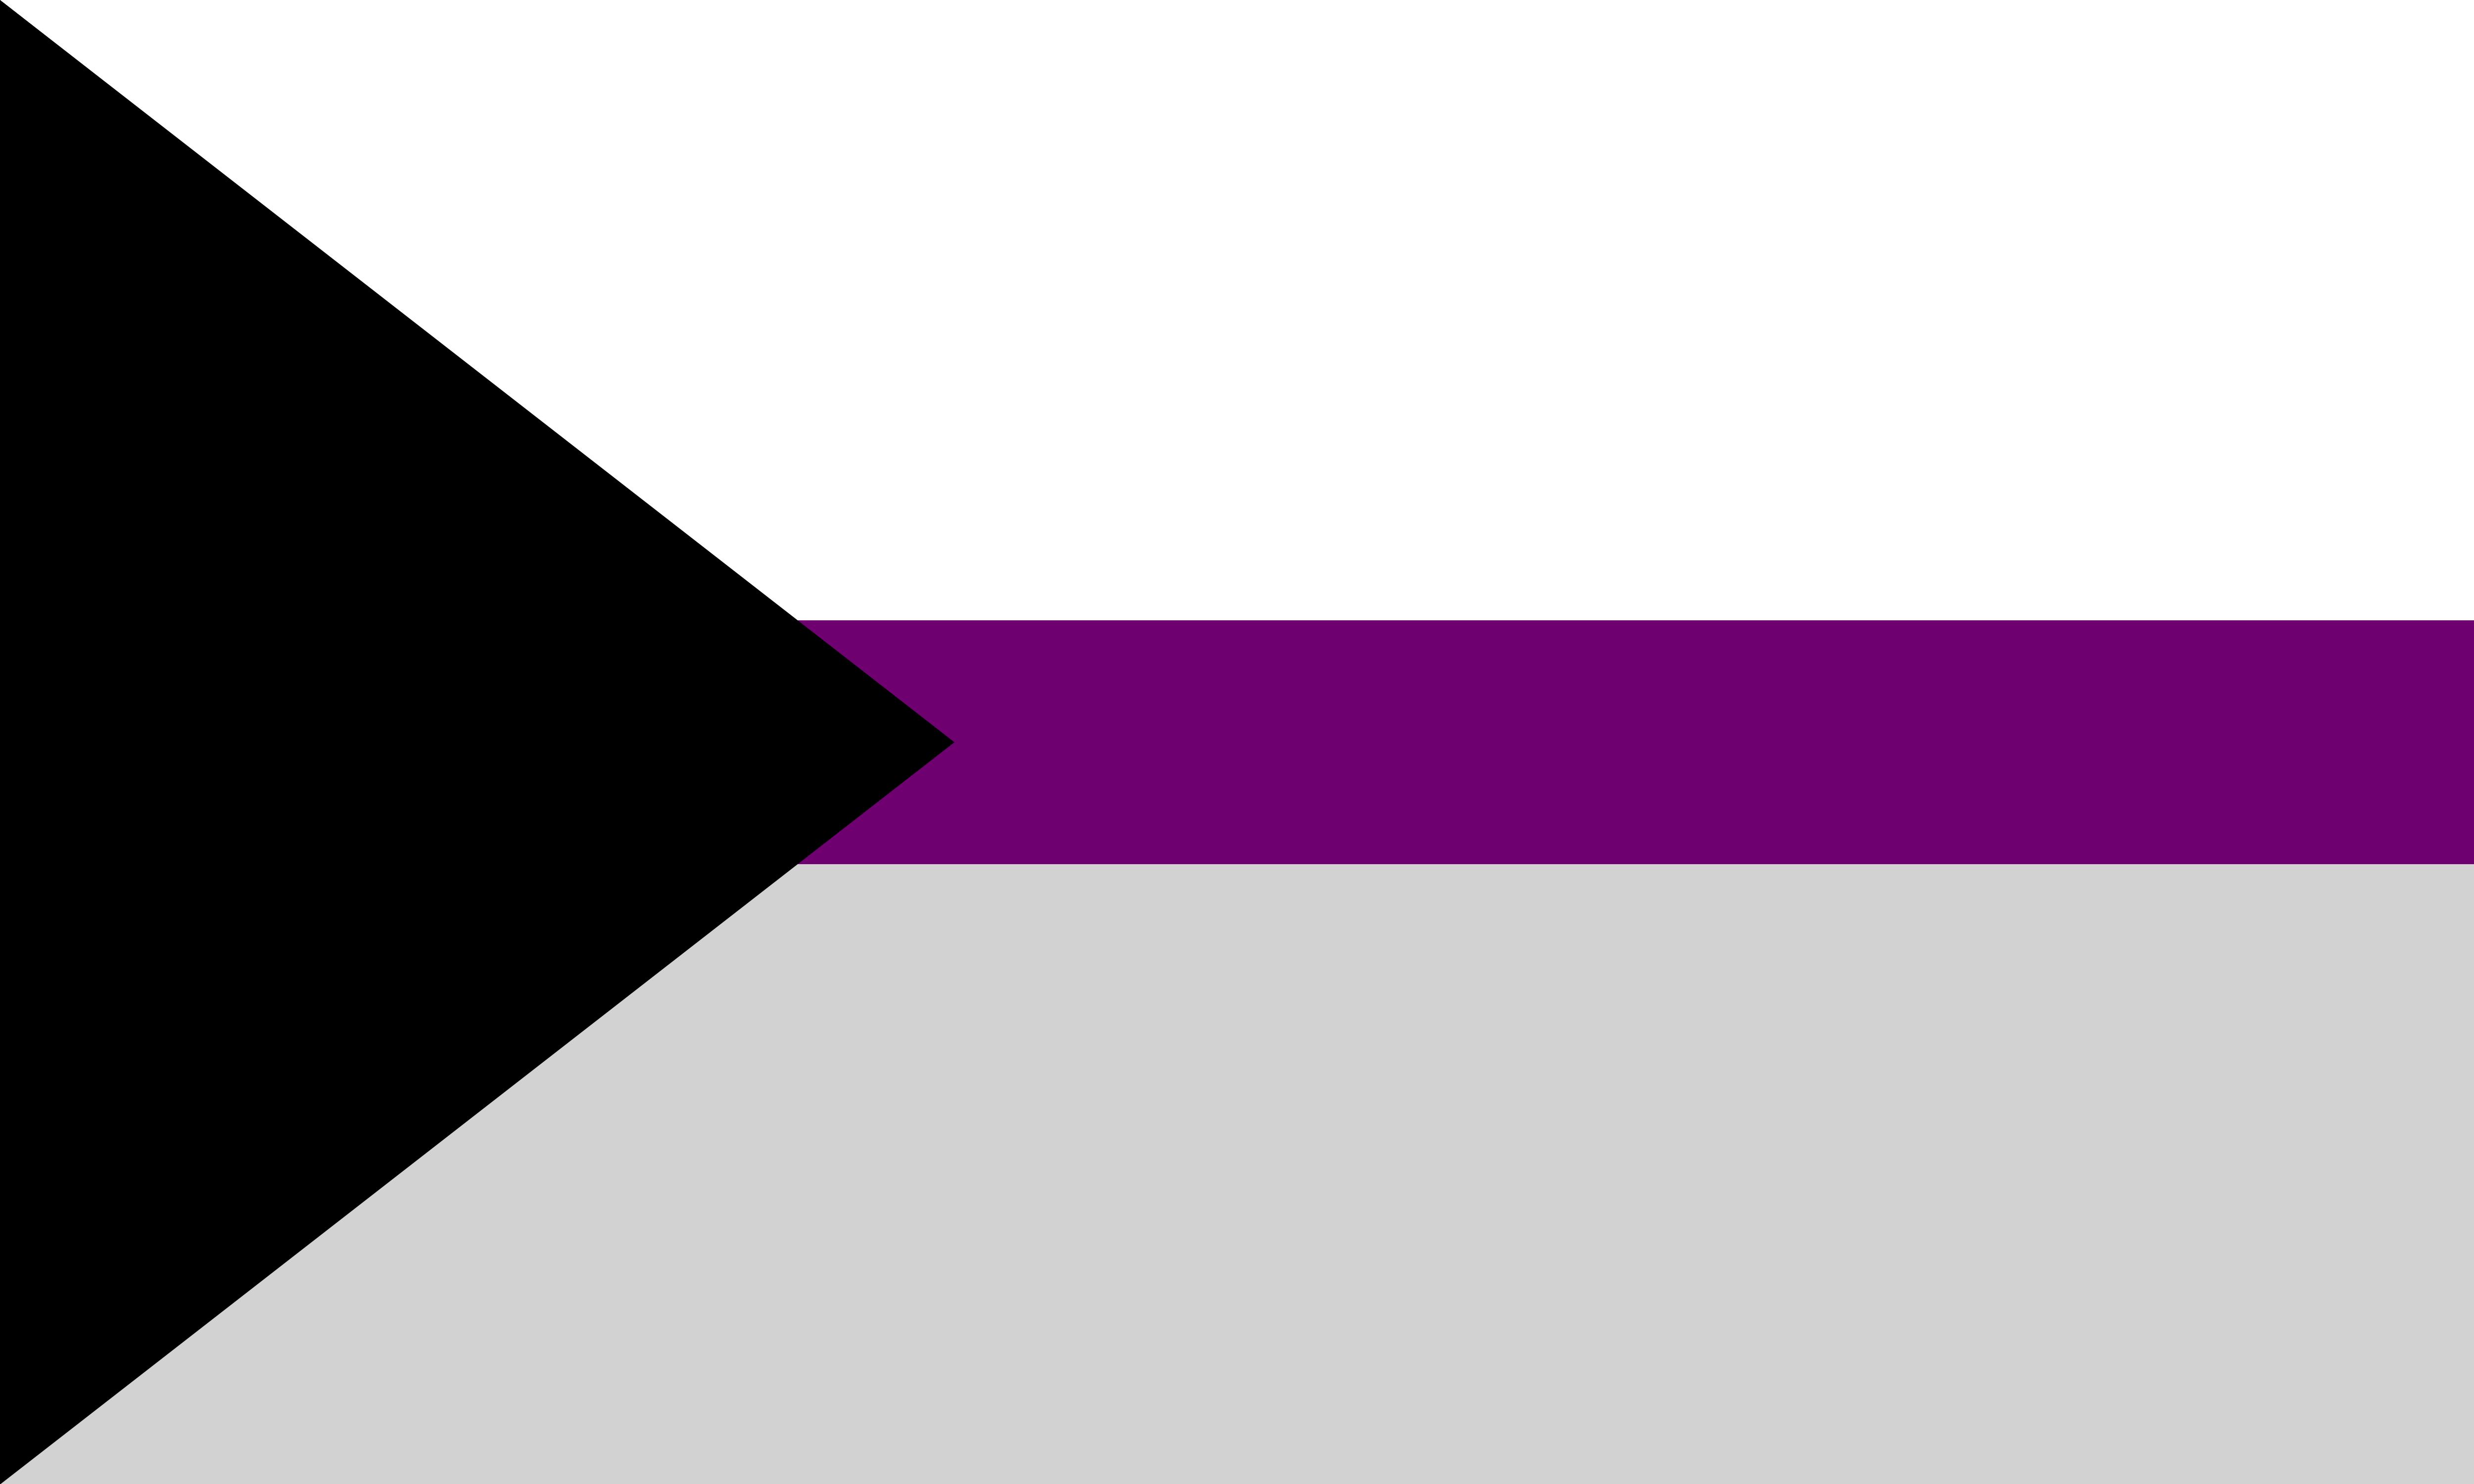 Demisexual by Pride-Flags